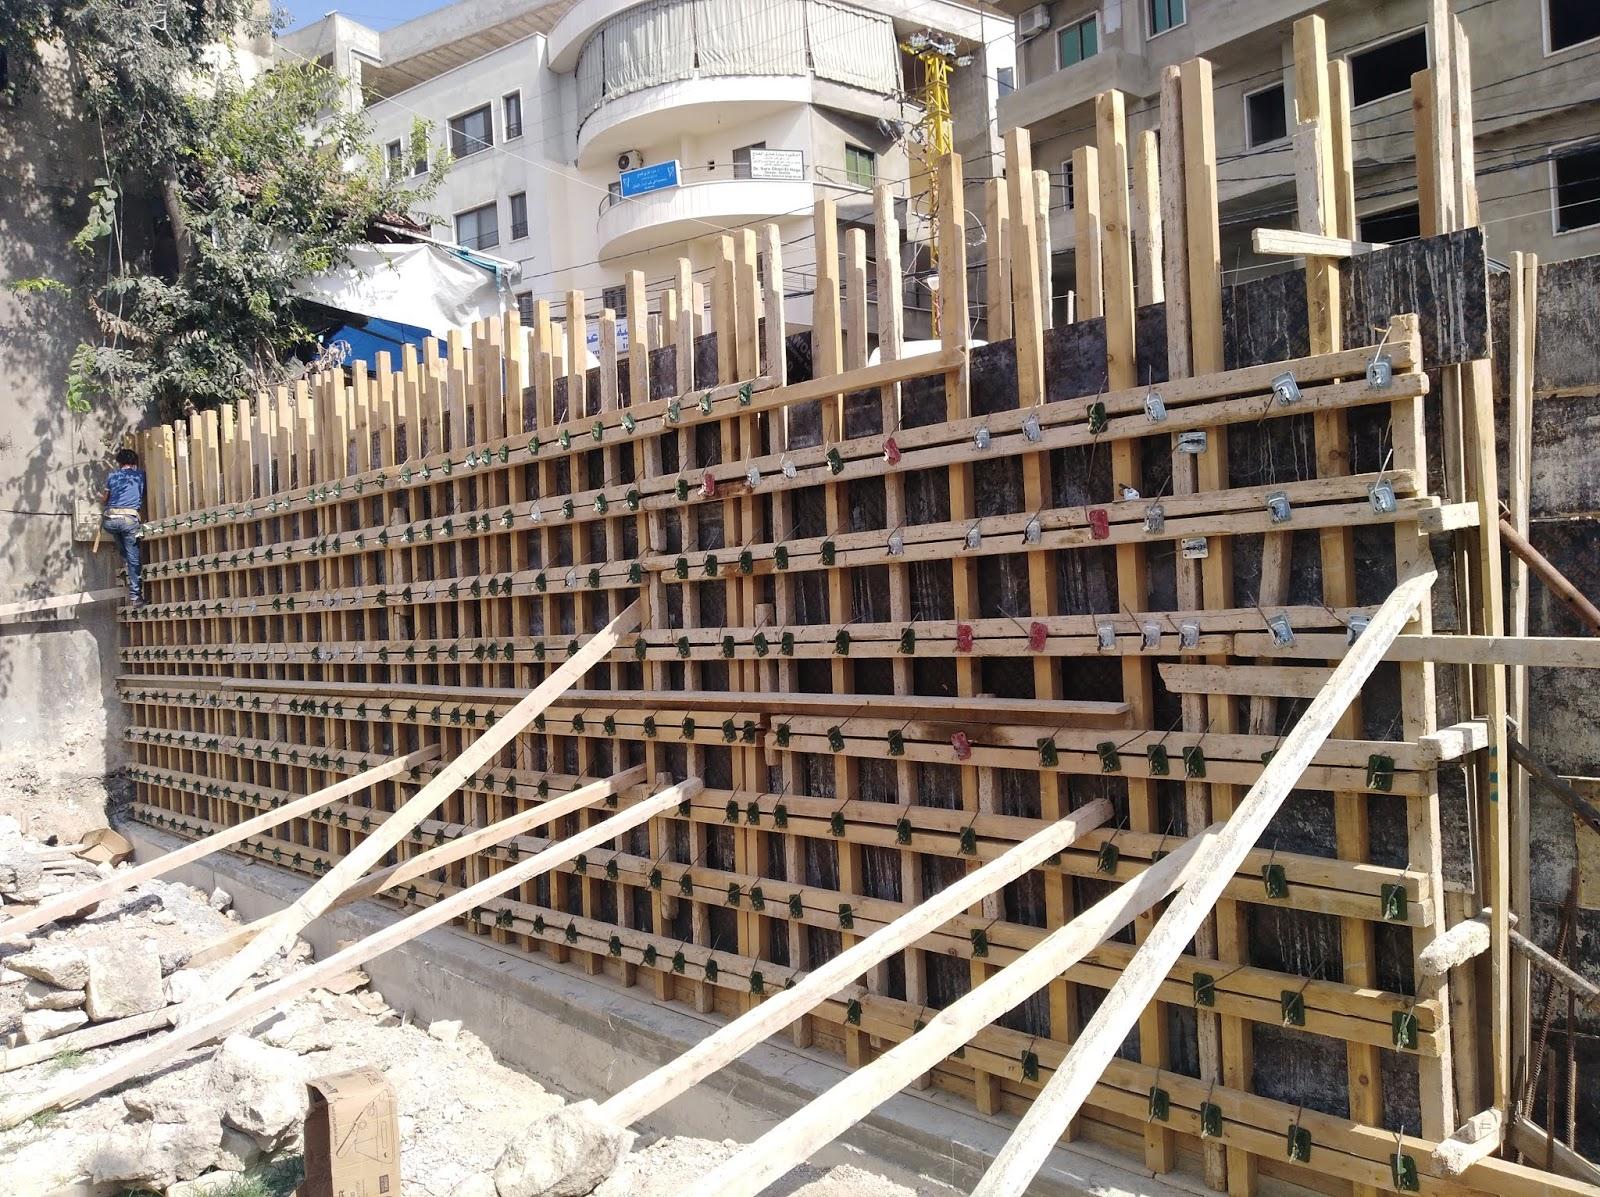 Concrete wall construction at Chehim